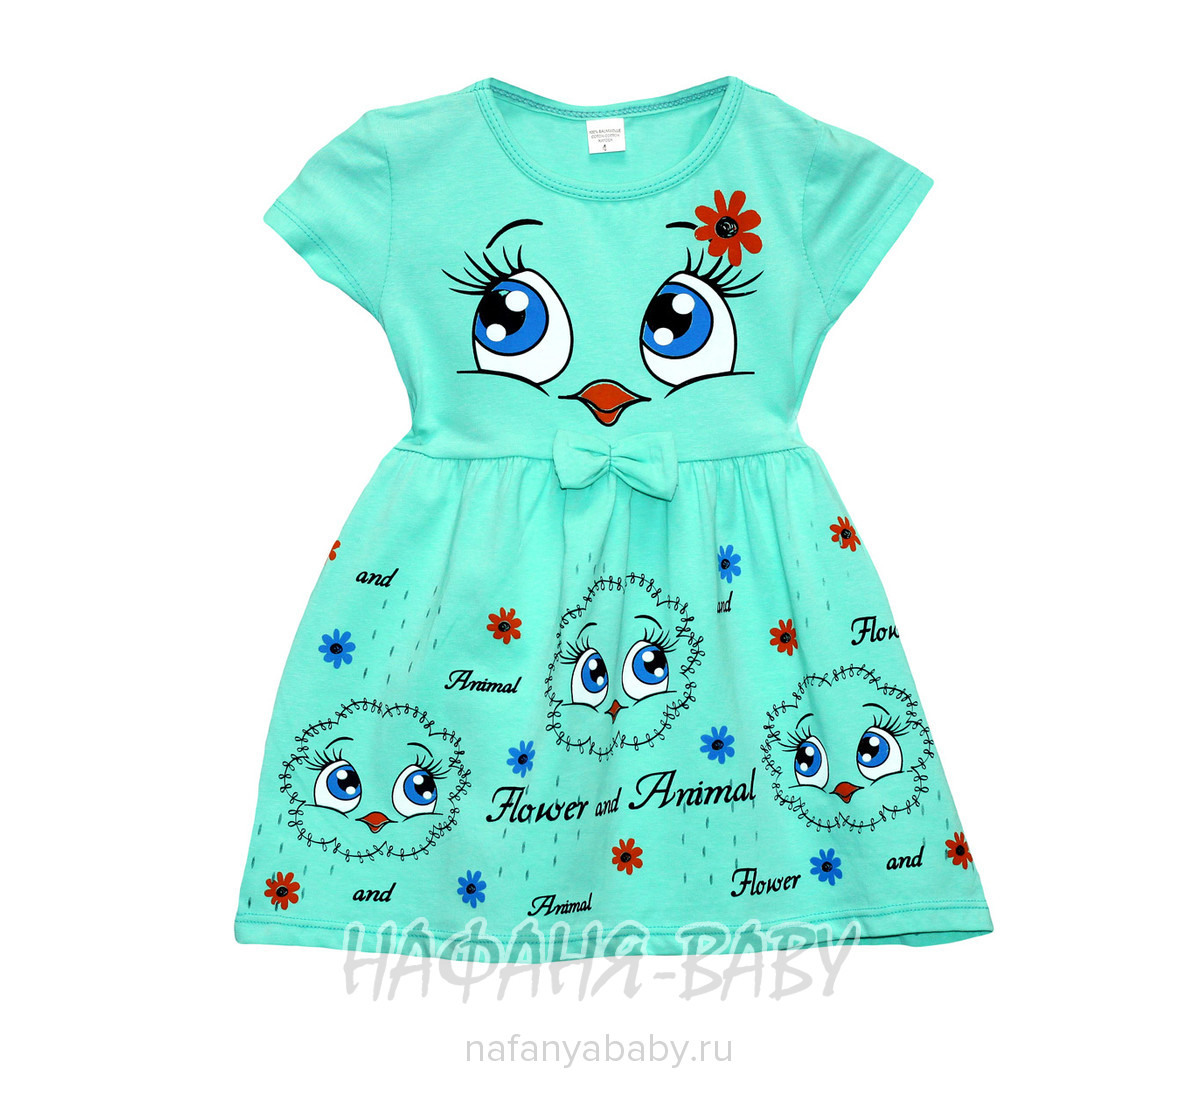 Детское платье CHILDS SMILE арт: 1385, 1-4 года, 5-9 лет, оптом Турция